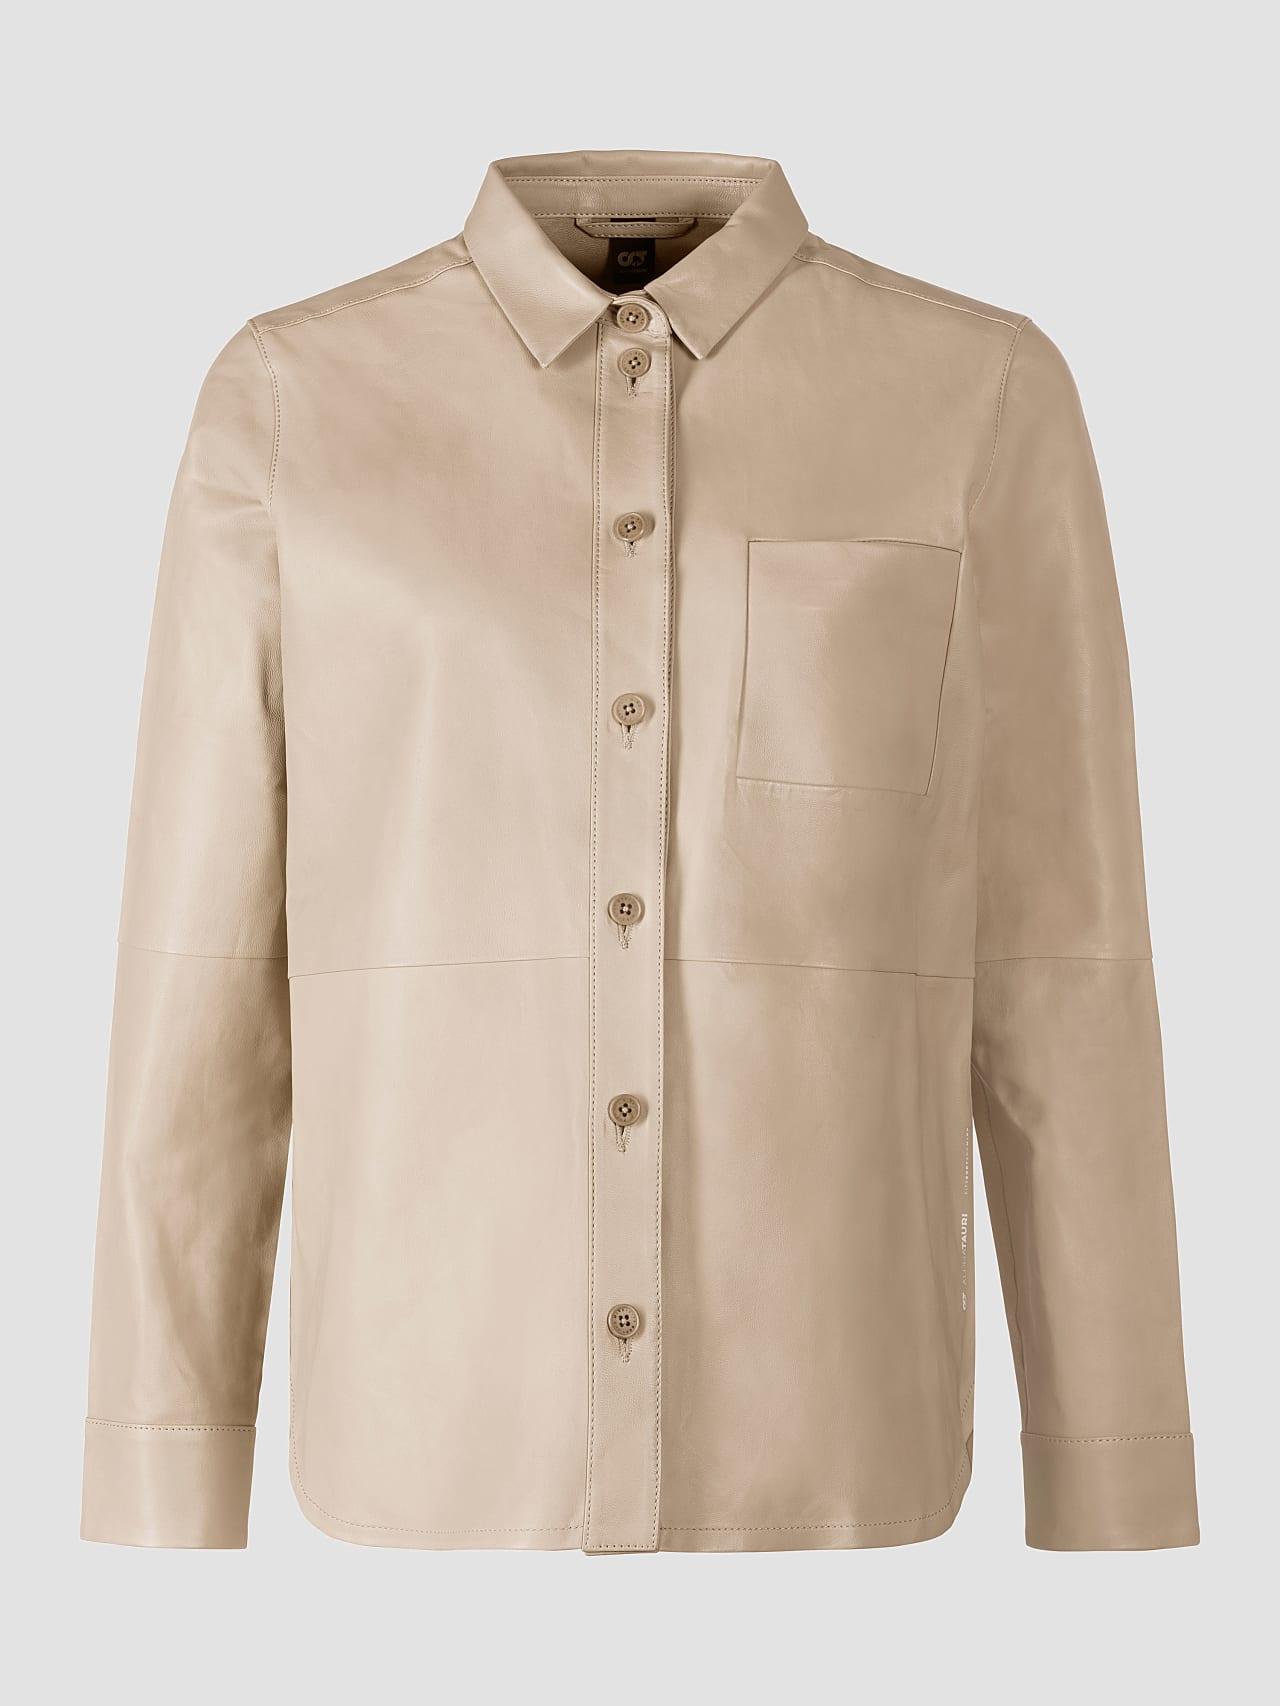 LEORD V1.Y5.01 Leather Shirt Sand Back Alpha Tauri